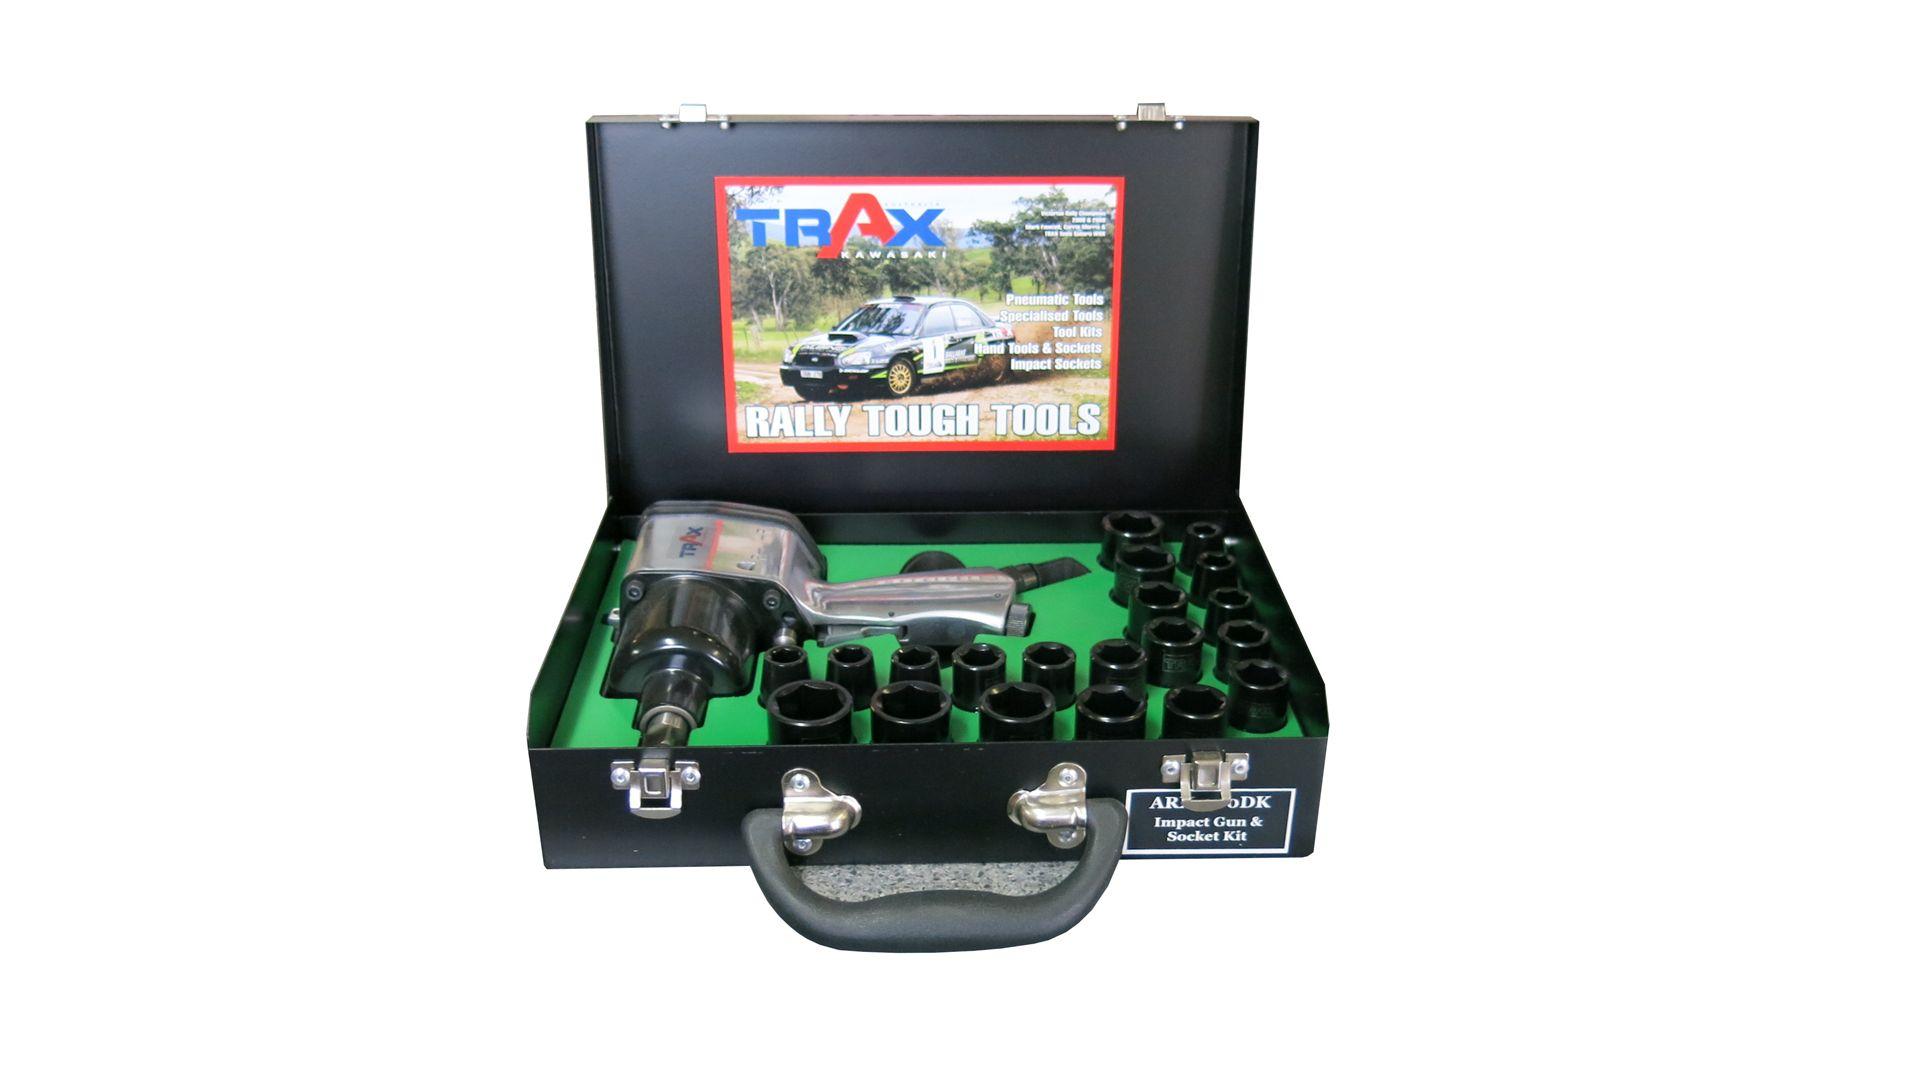 1 2 Quot Impact Gun Kit Arx 300dk Trax Tools